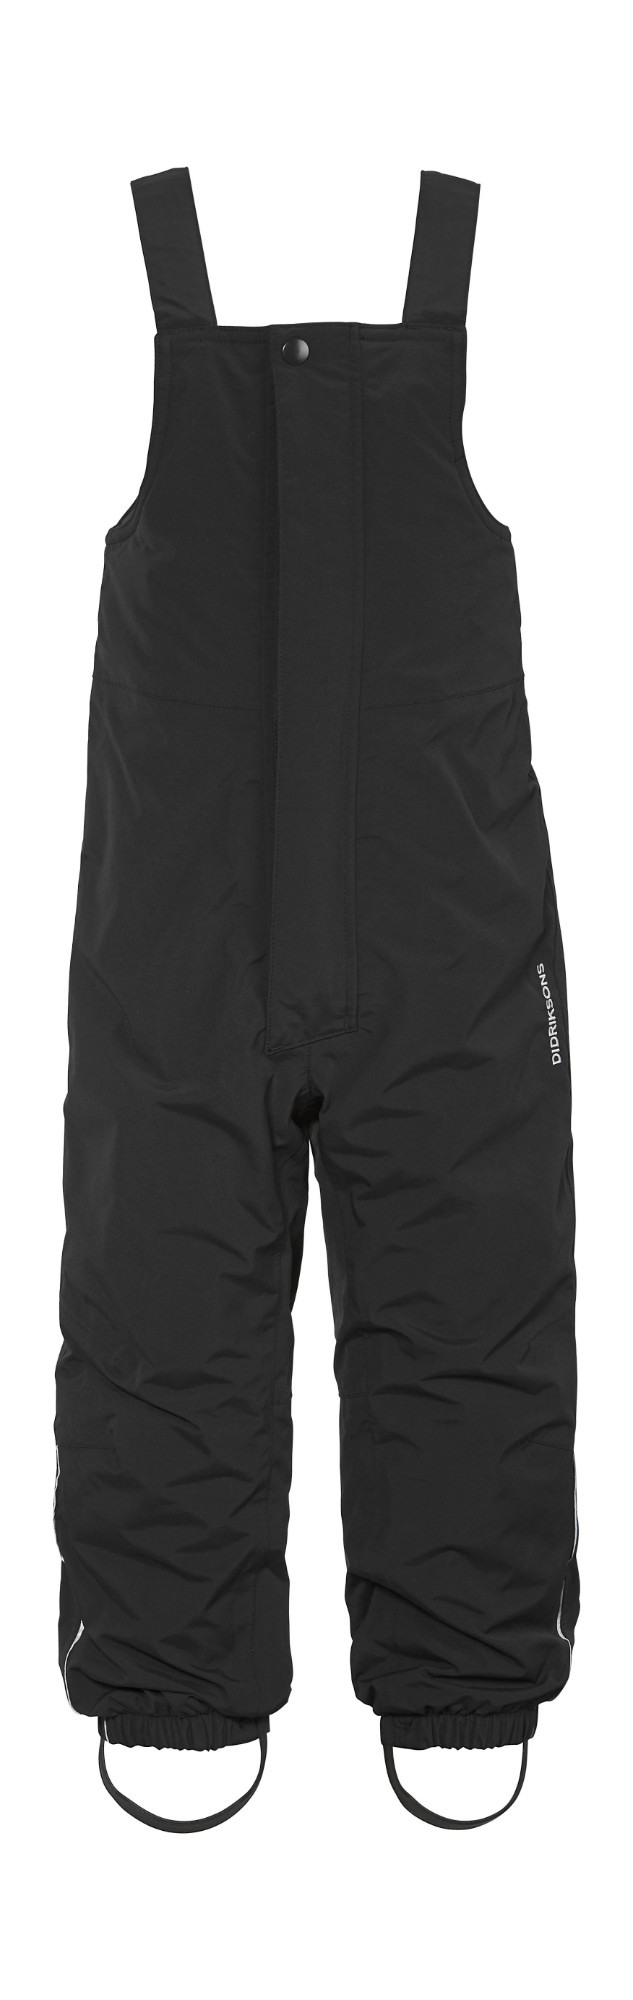 DIDRIKSONS Tarfala Kid's Pants 5 Black 140